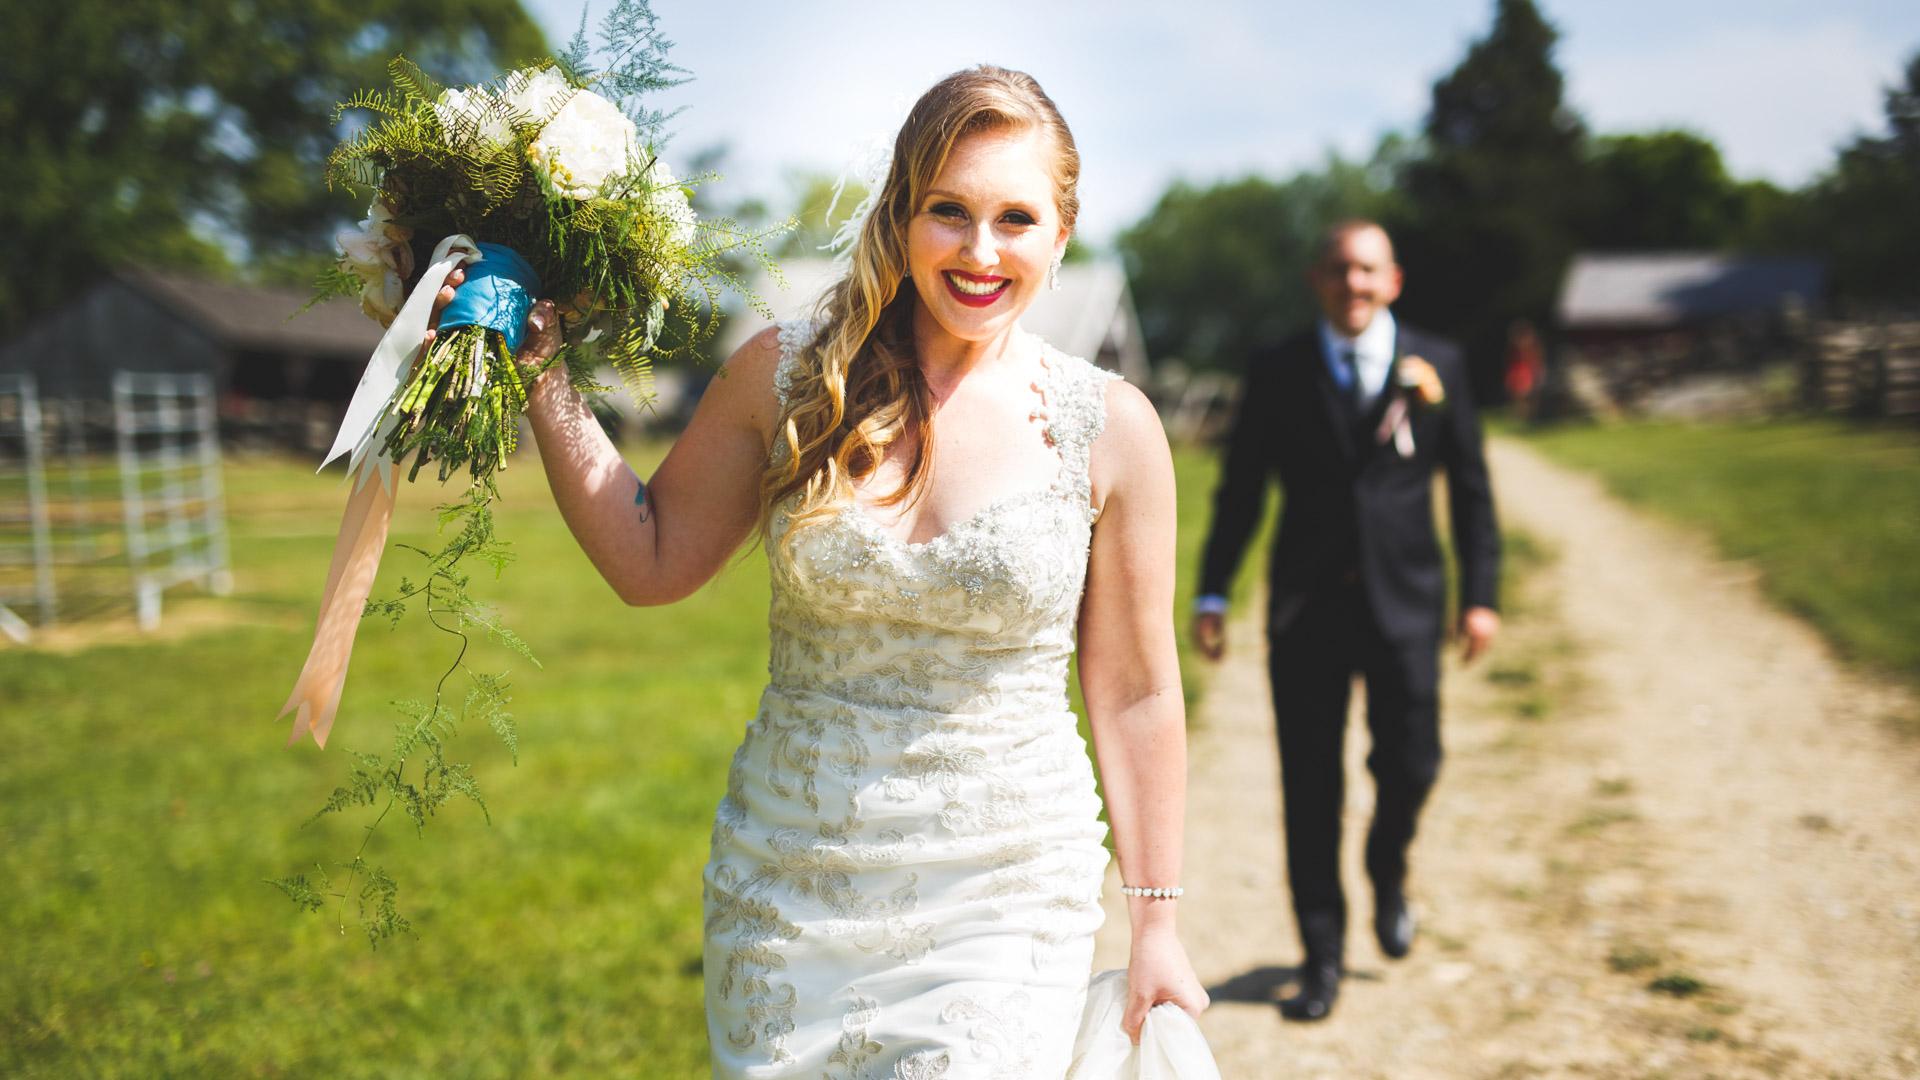 Bride-Walking-Wedding-Photography-Connecticut.jpg